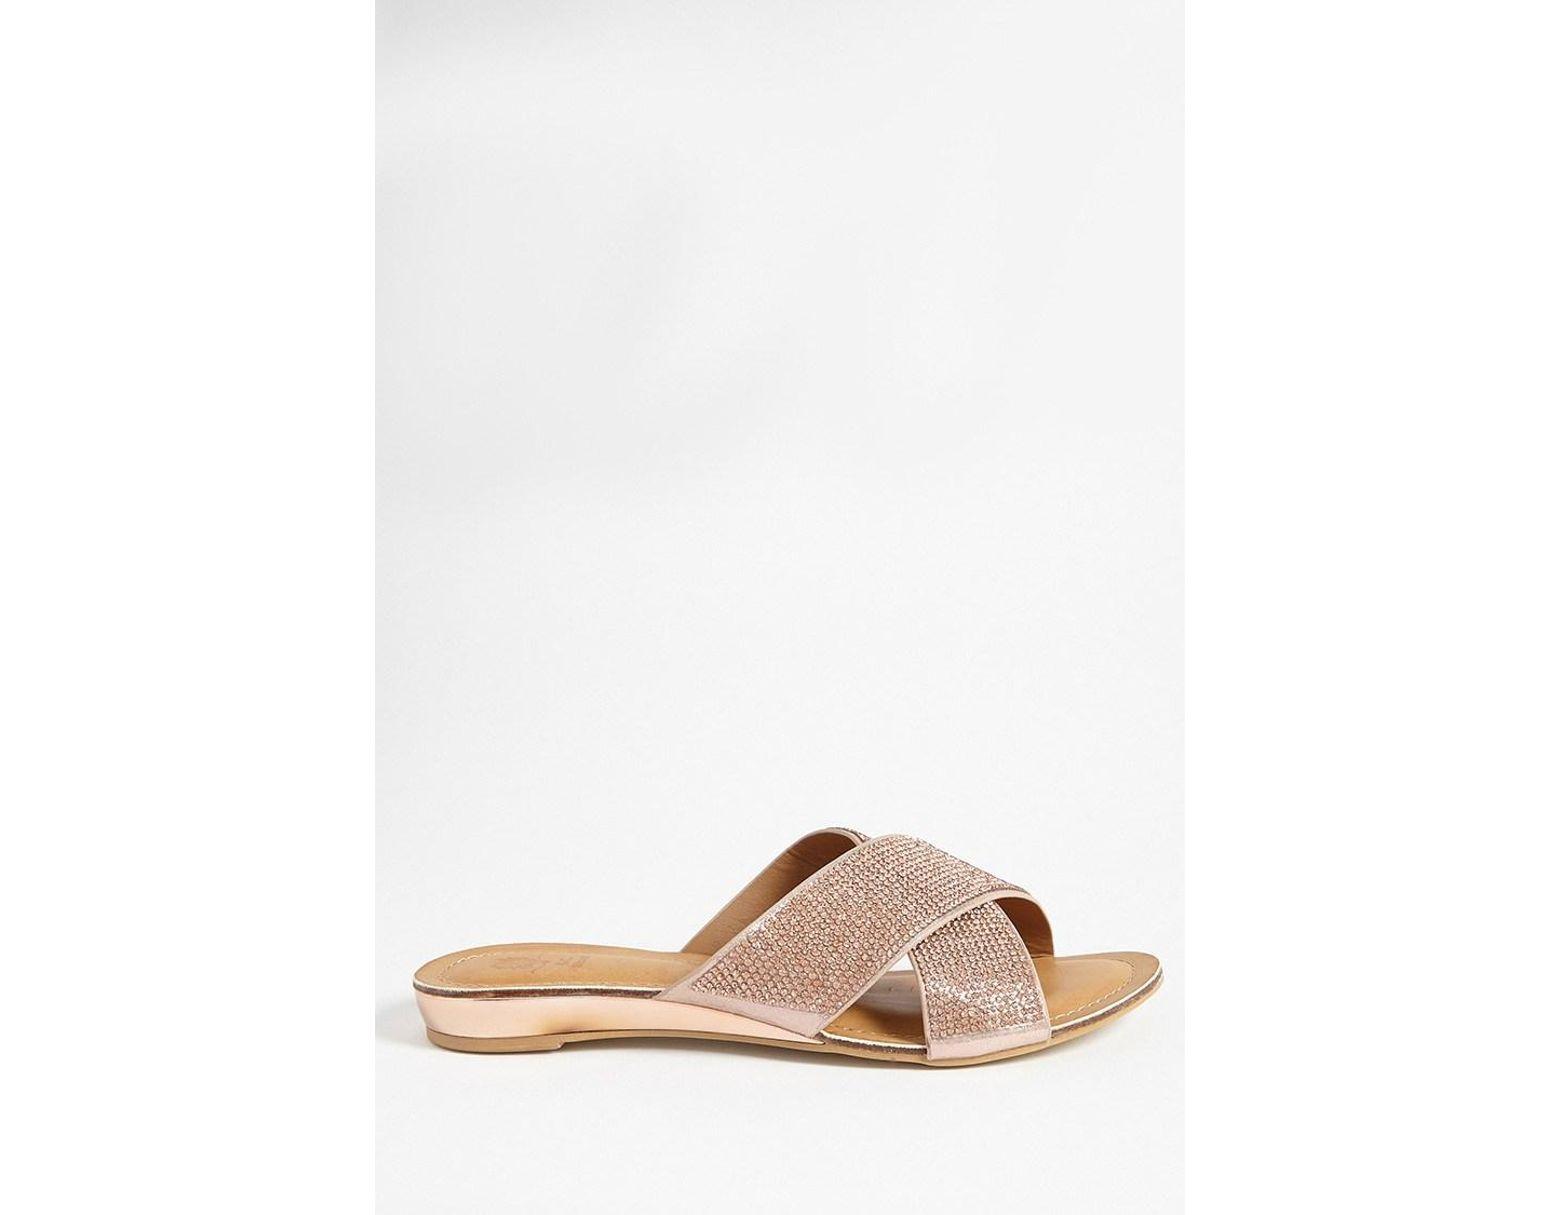 5660879152aa Lyst - Forever 21 Rhinestone-embellished Crisscross Slide Sandals - Save 13%